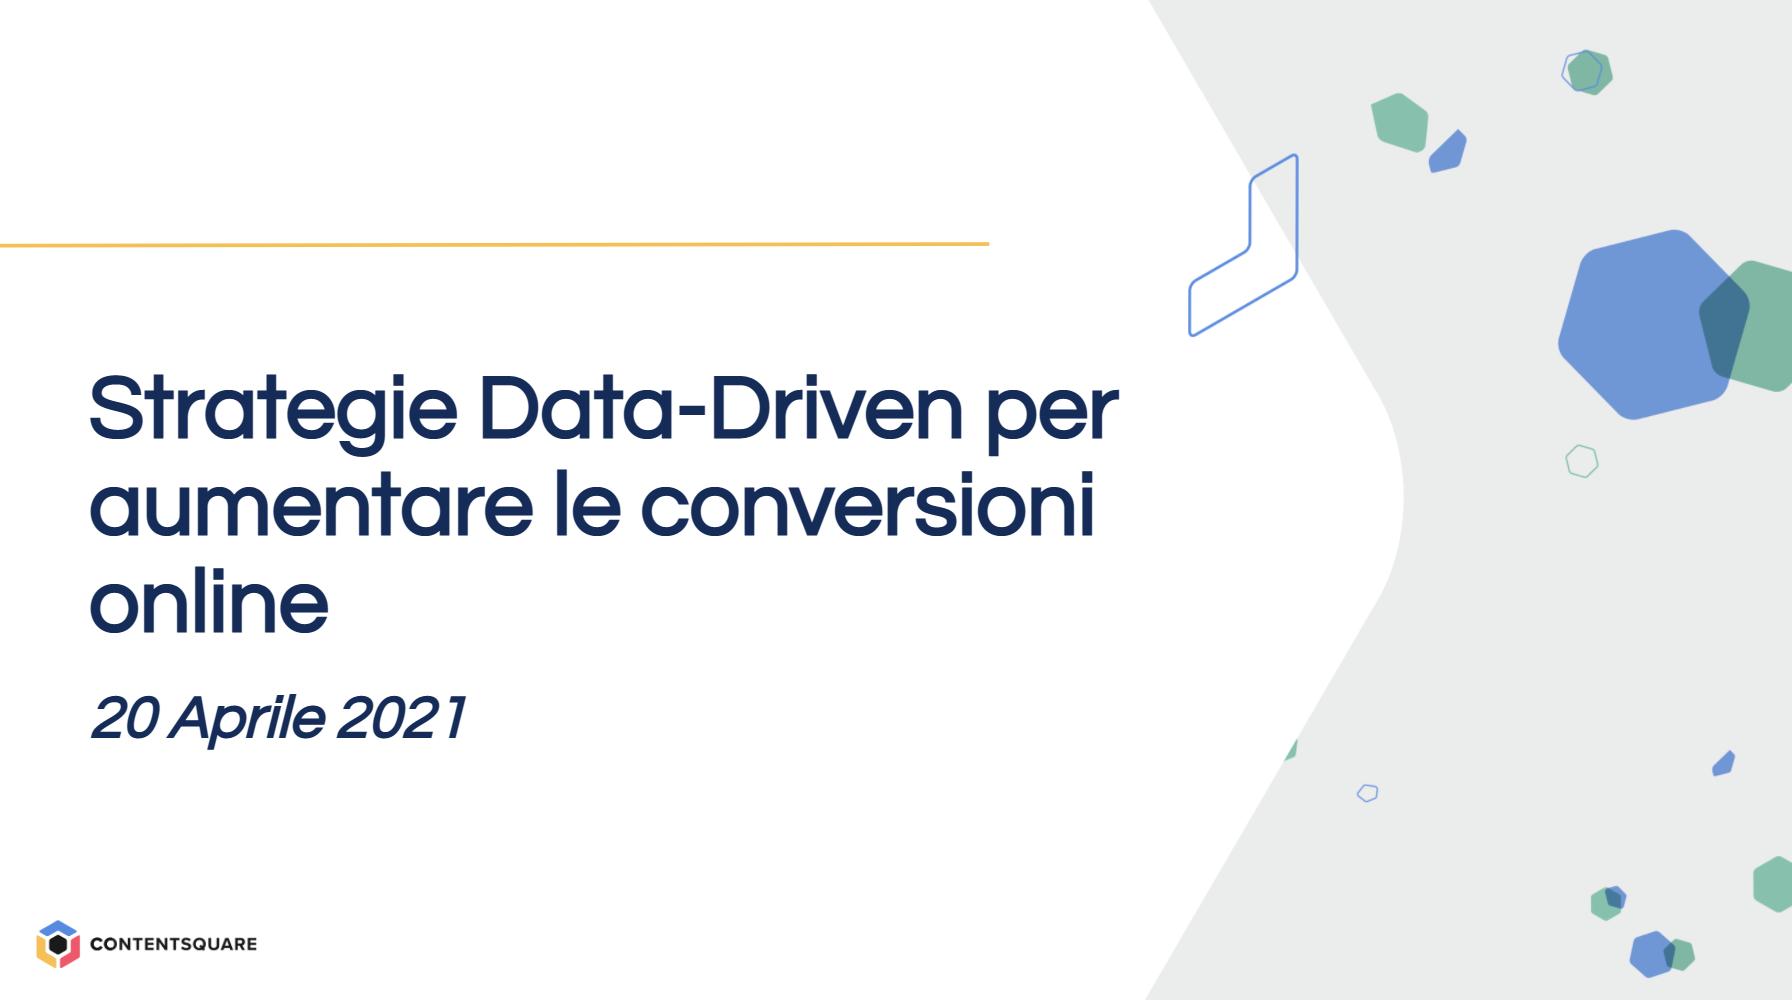 strategie data-driven